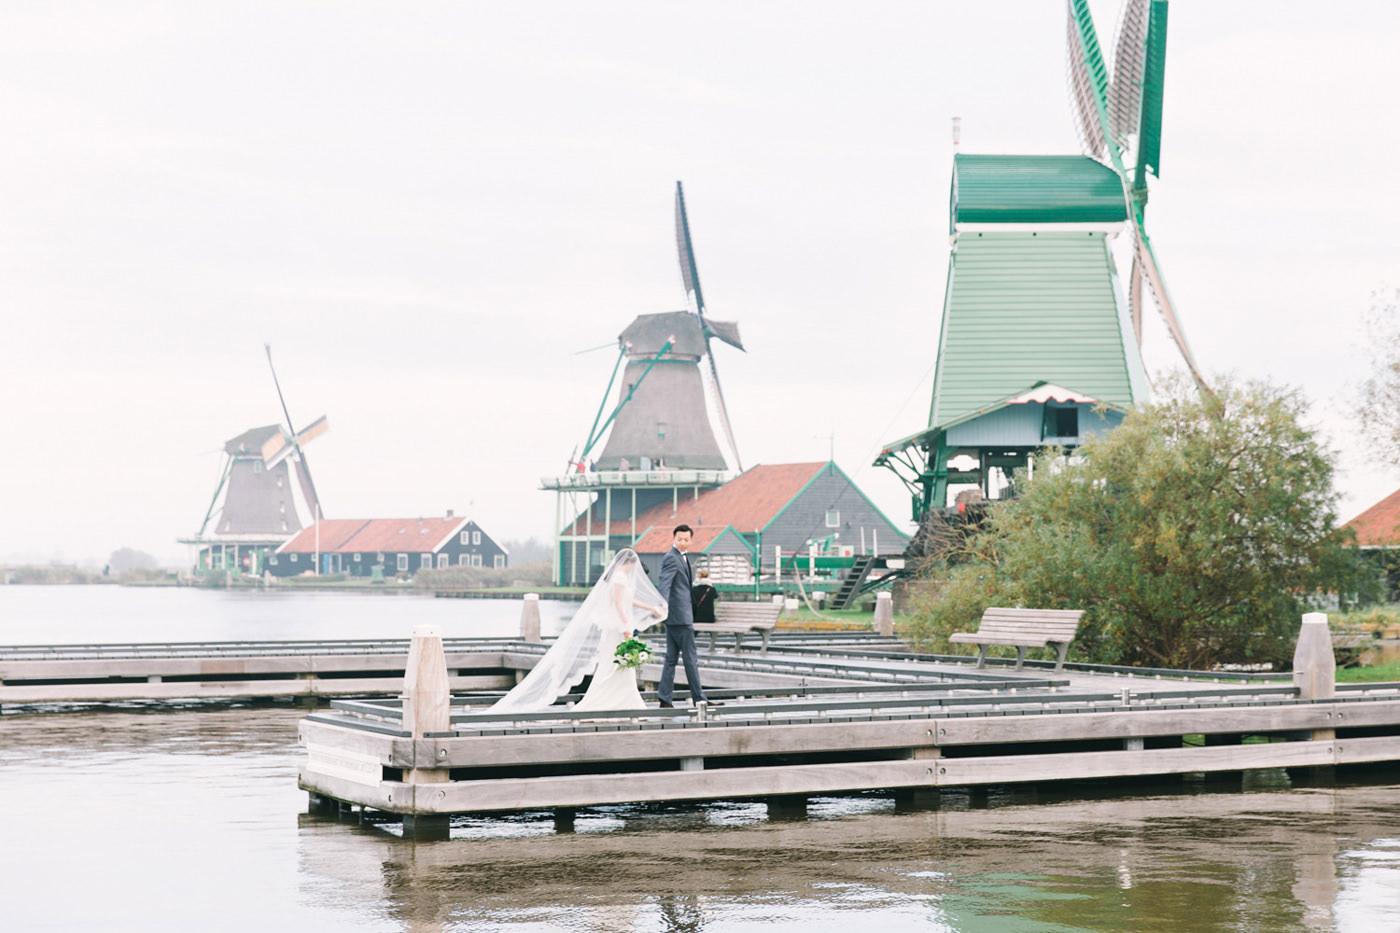 Fine_Art_Photographer_Bridal_Session_in_Zaanse_Schans_Amsterdam_